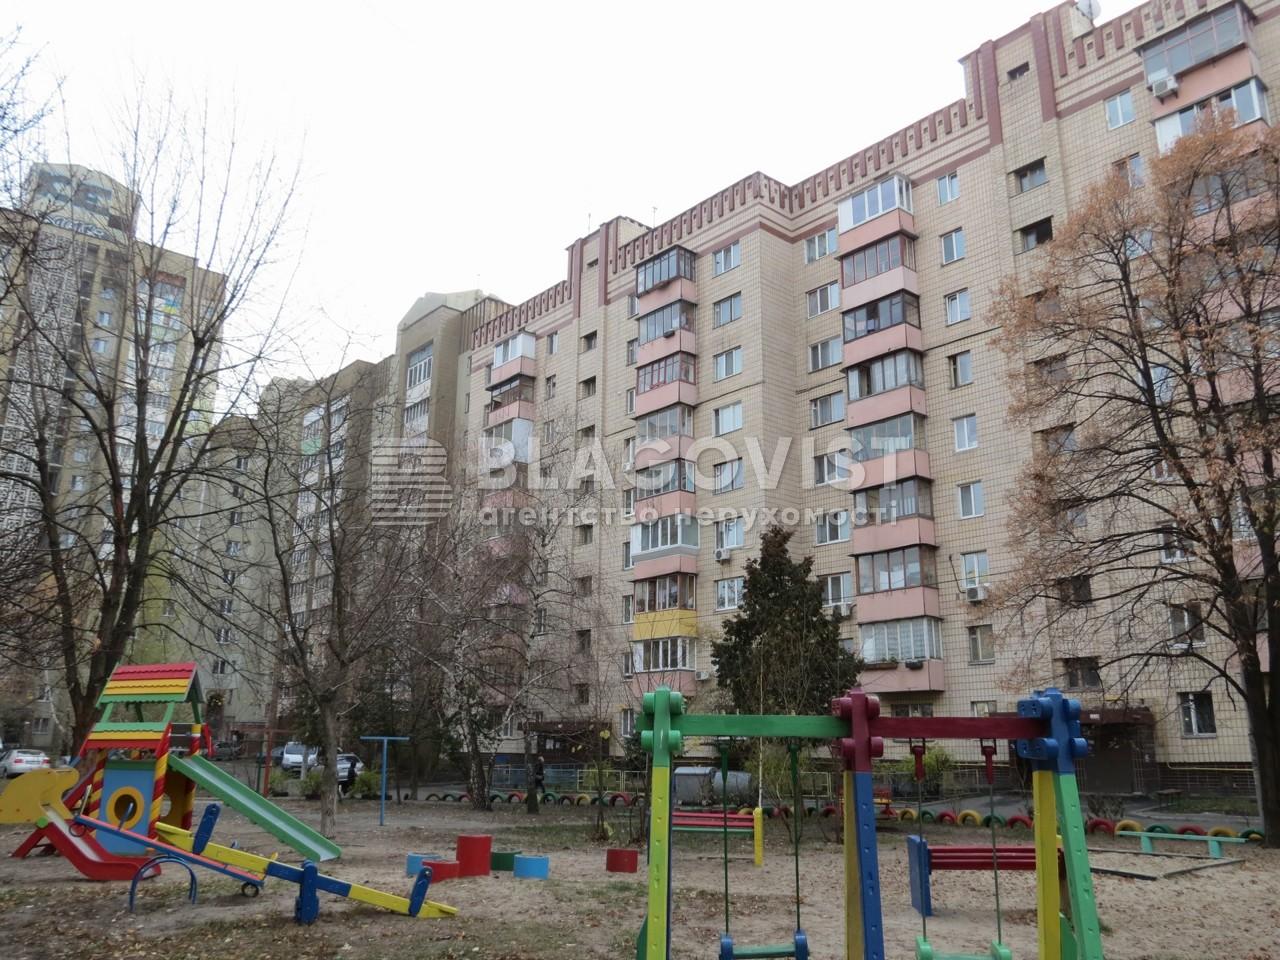 Квартира C-101846, Харьковское шоссе, 55, Киев - Фото 3